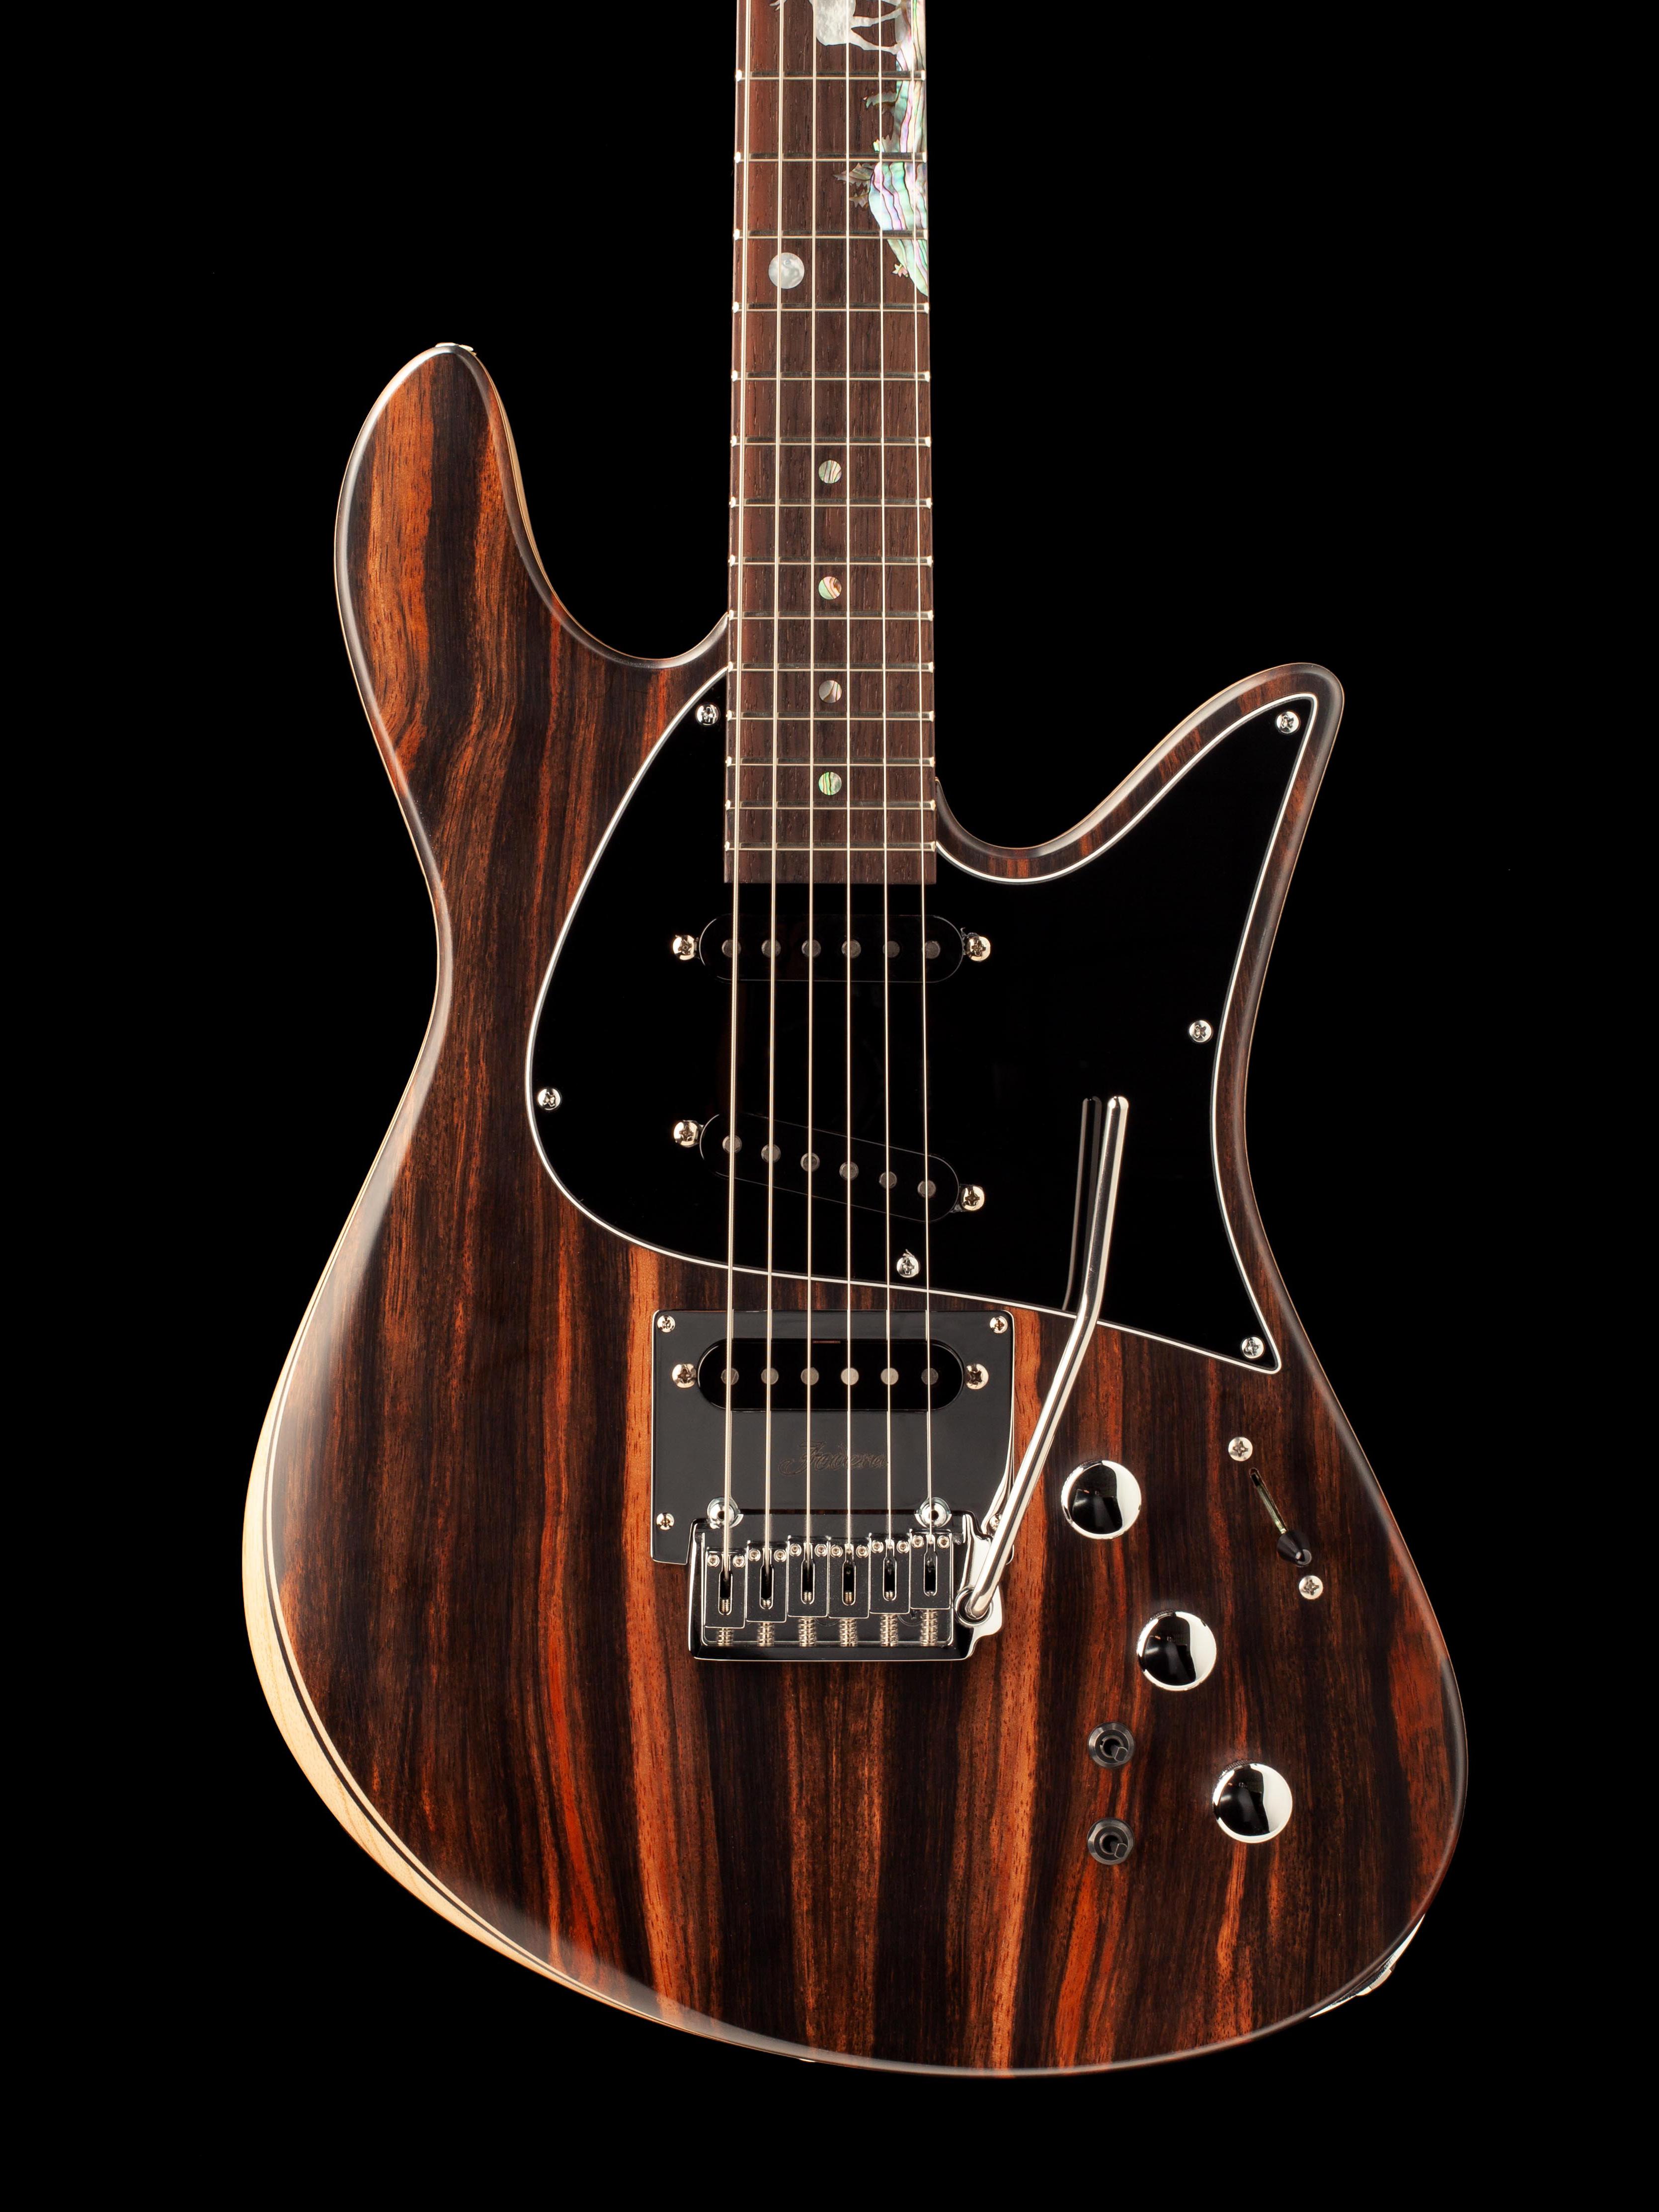 Six-String Guitar Body With Whammy Bar